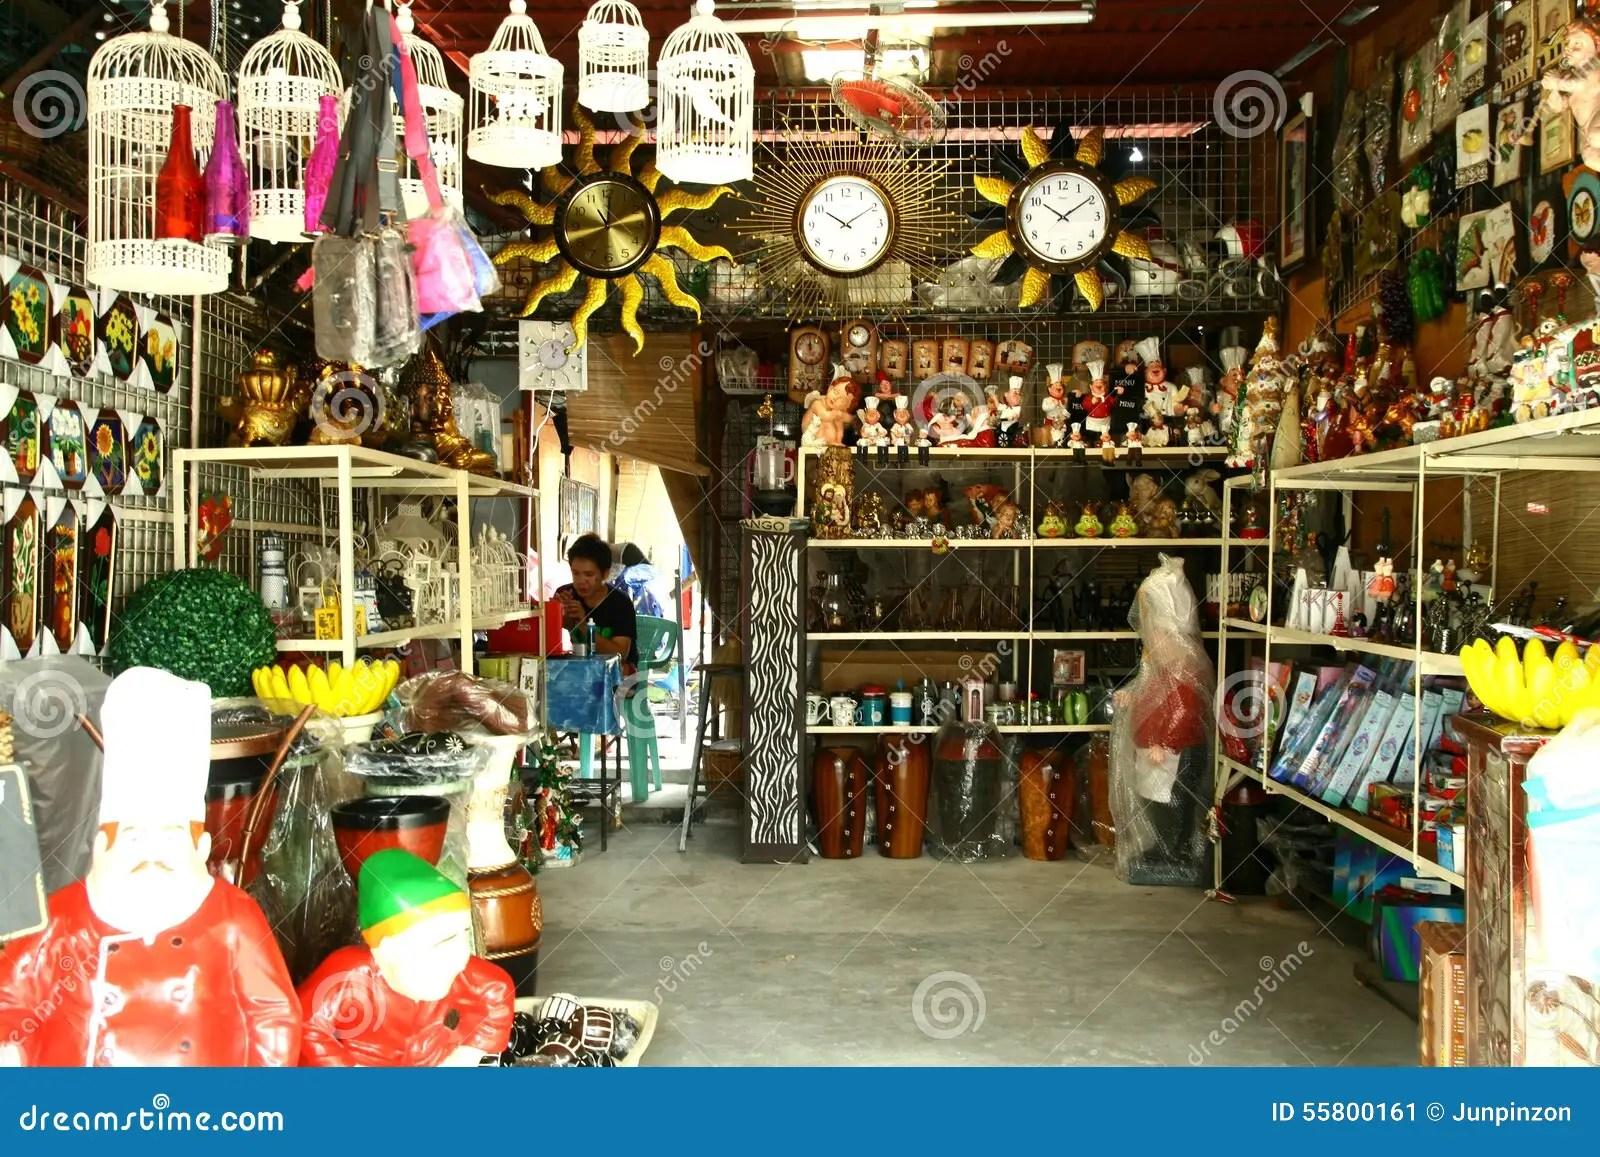 Flea Market Stores In Dapitan Arcade In Manila Philippines